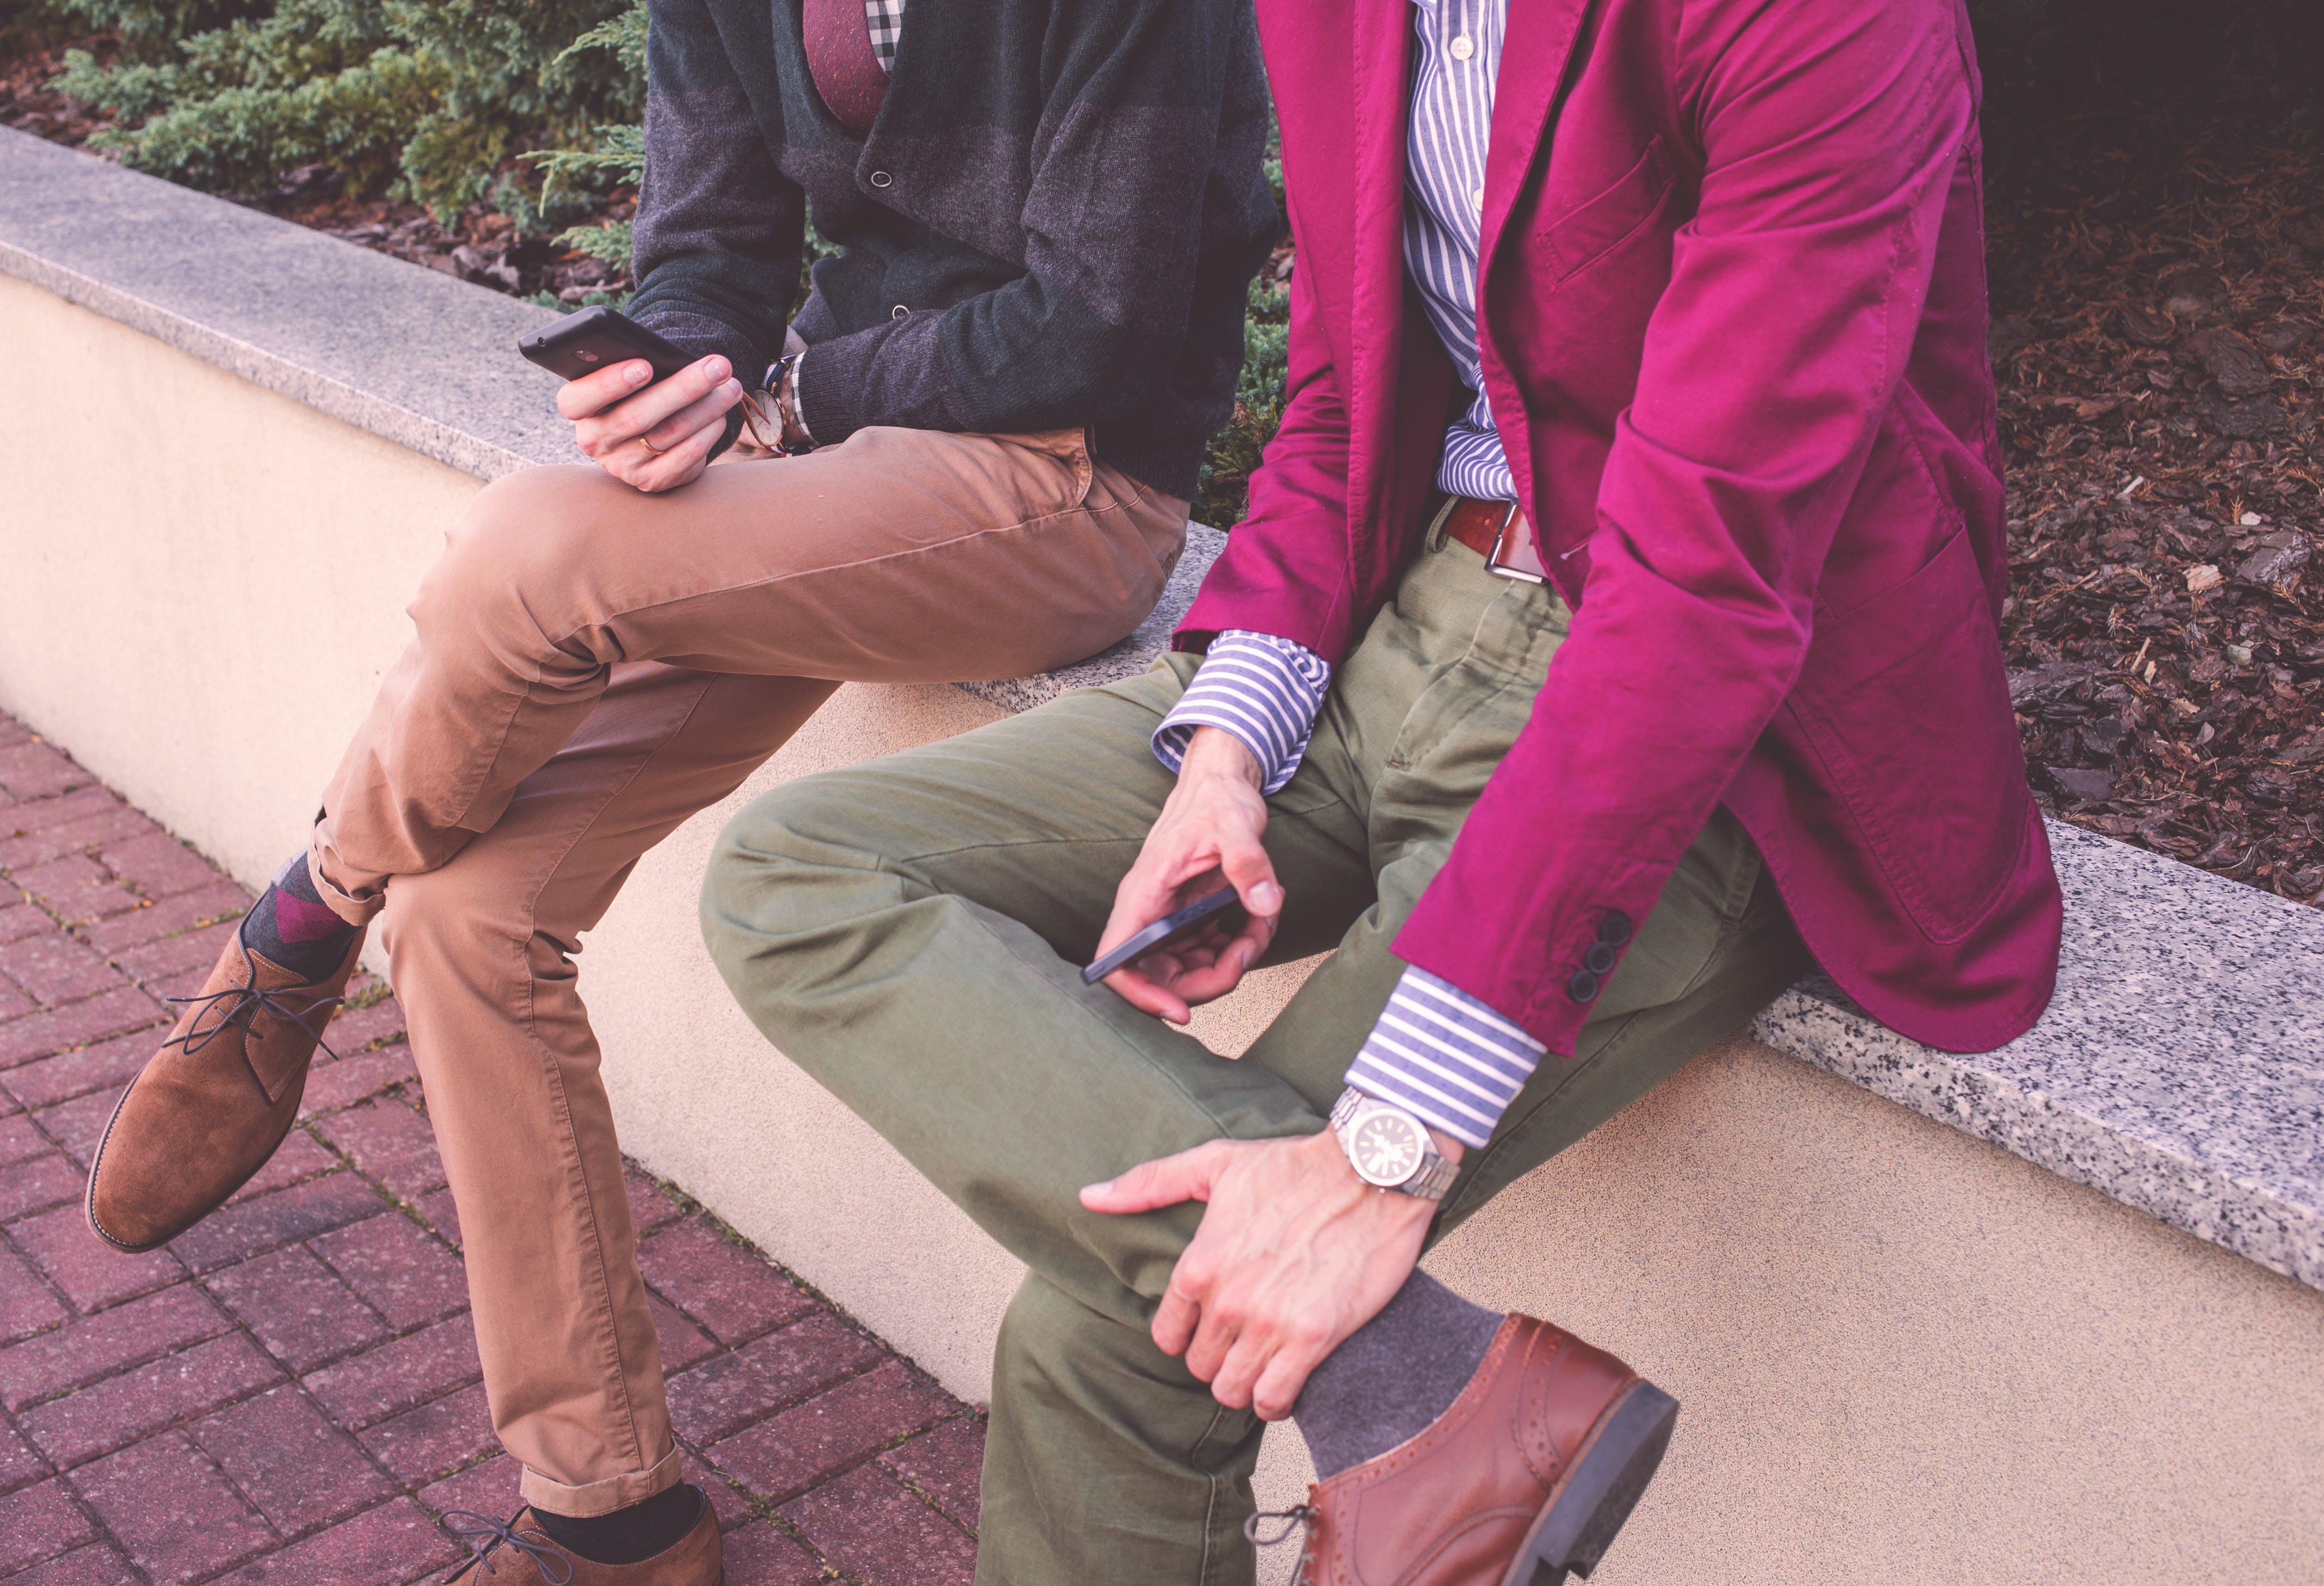 2 Men Wearing Formal Attire Sitting Beside Each Other